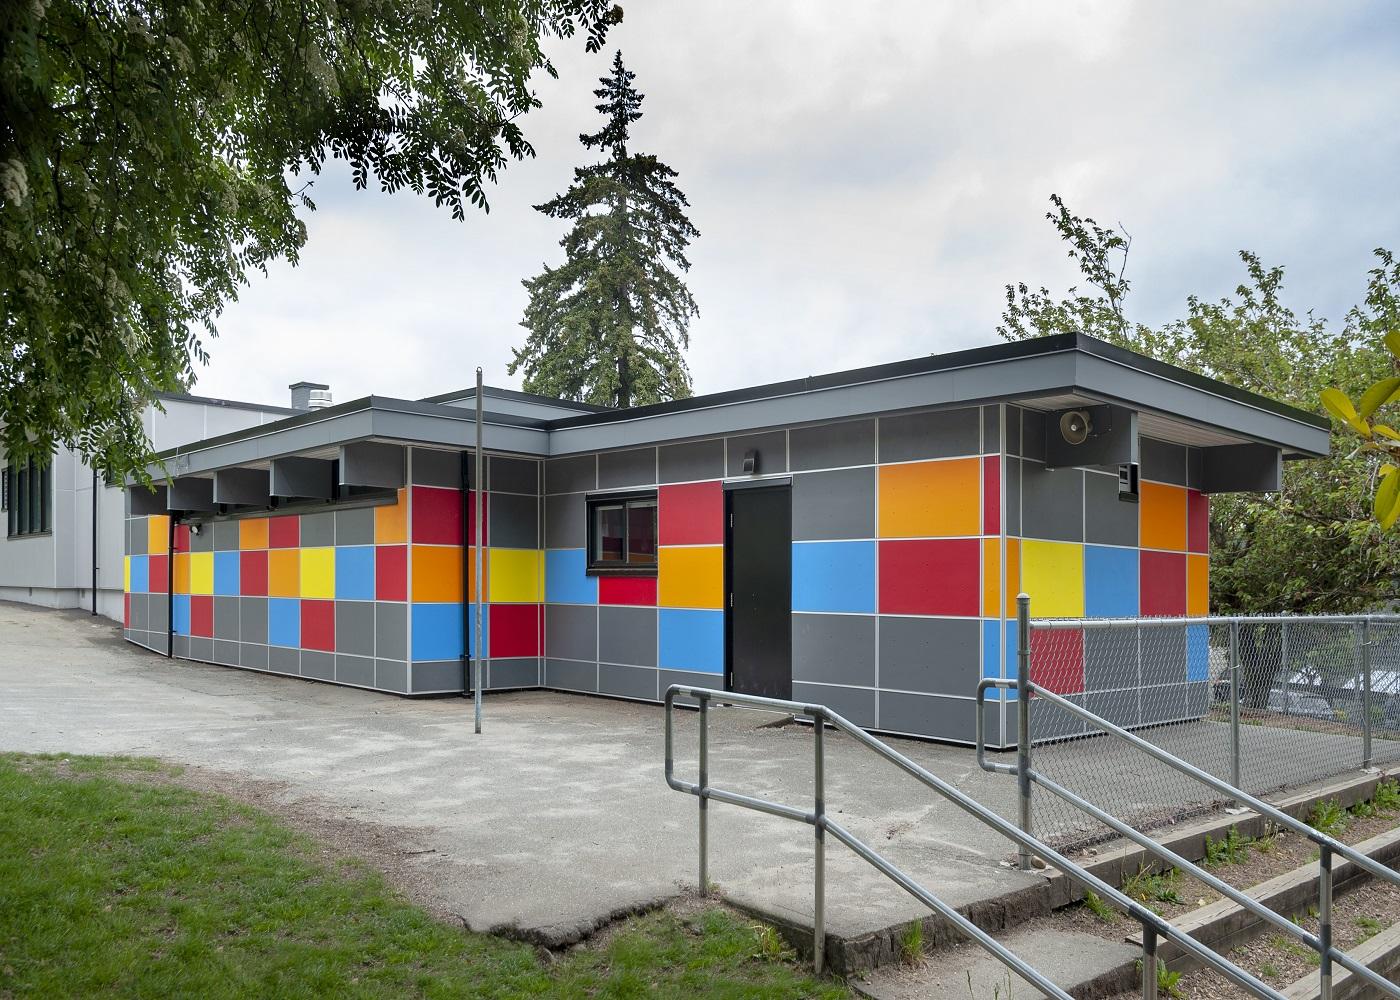 Irwin Park Elementary